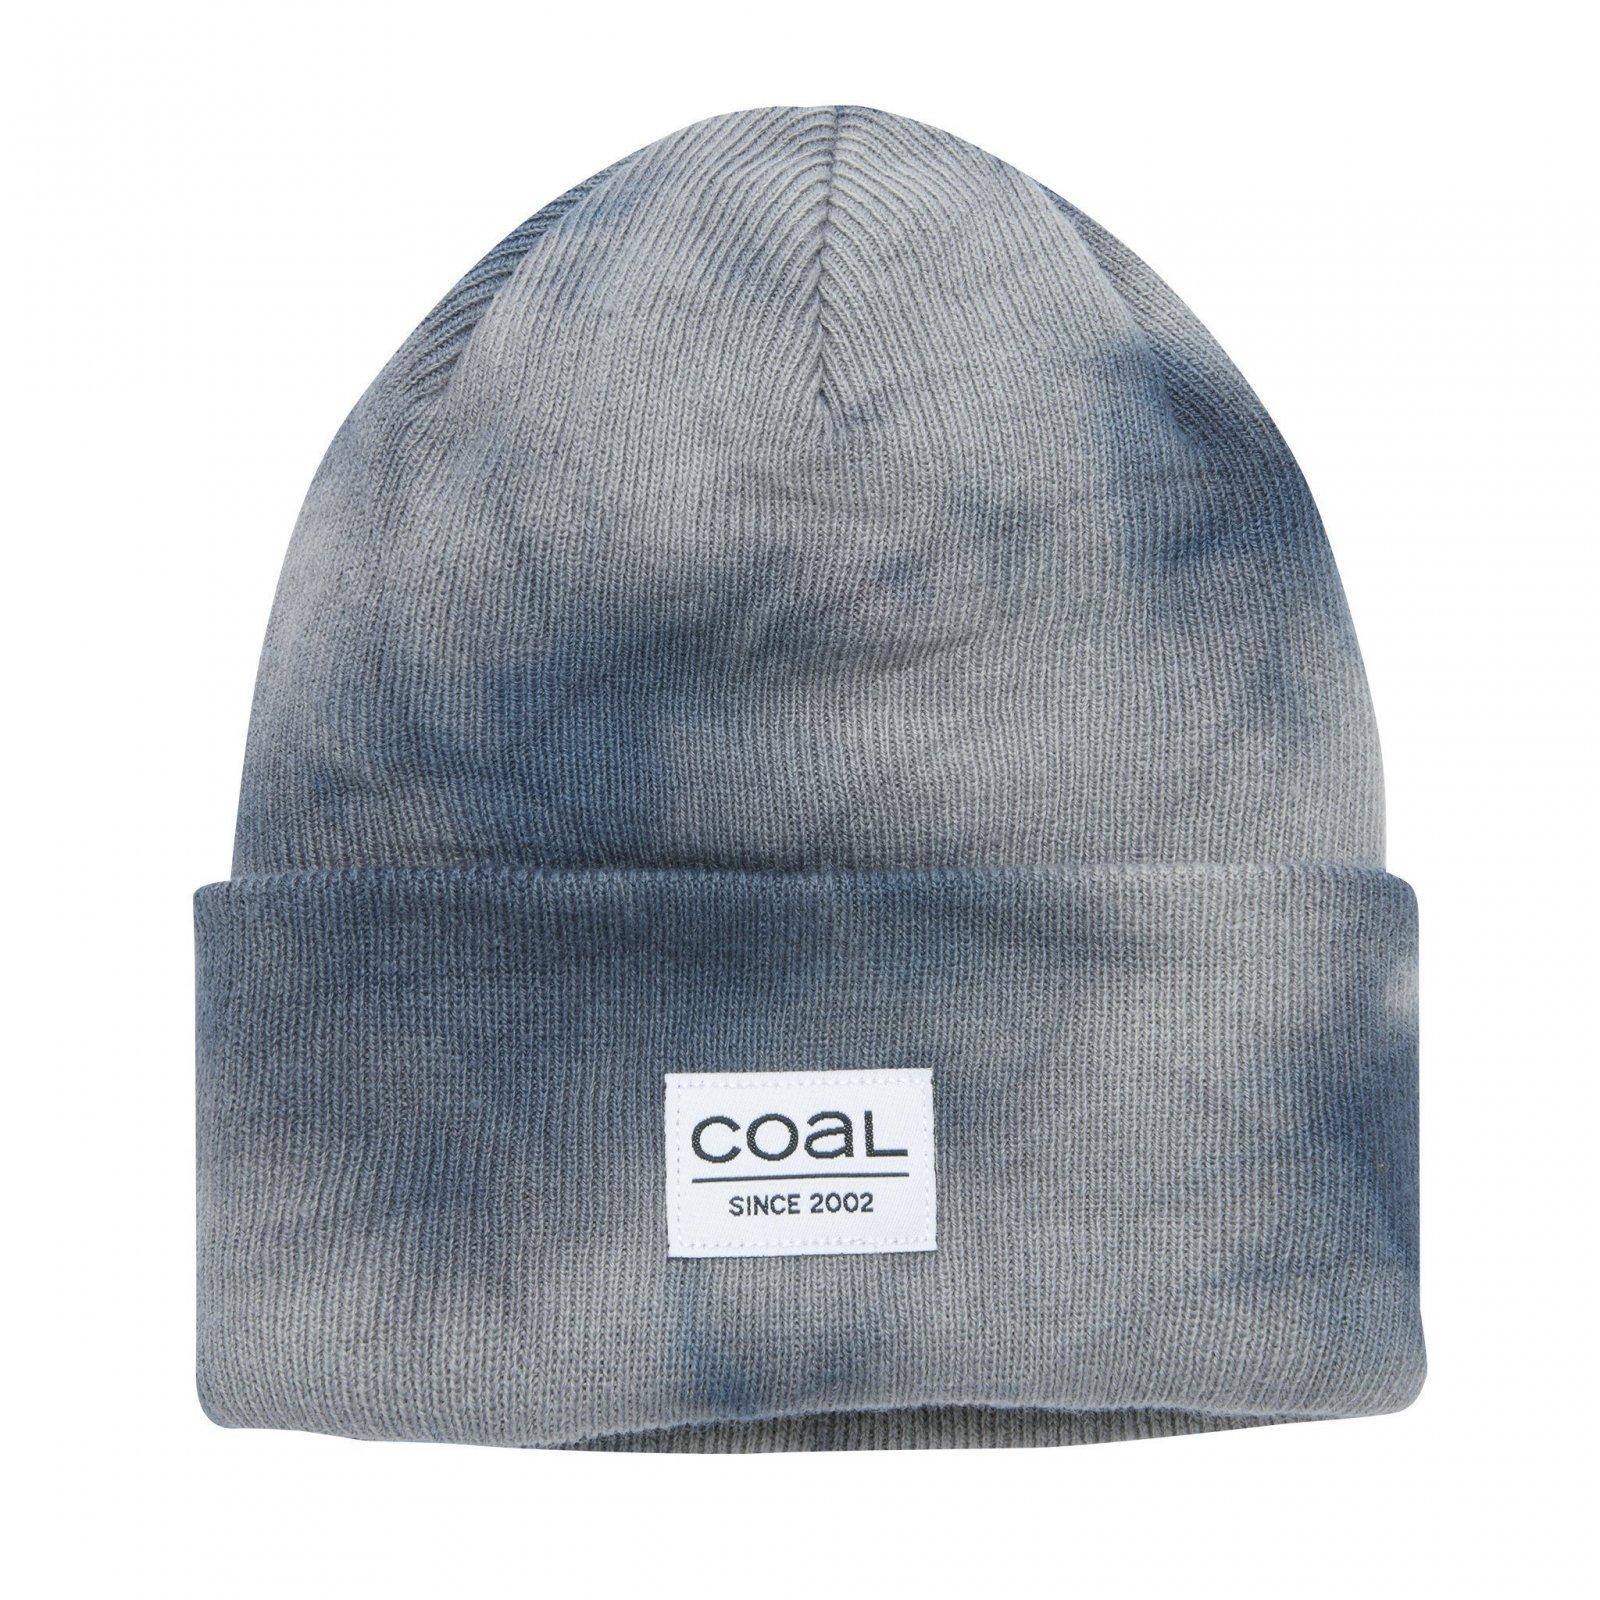 Coal The Standard Acrylic Knit Cuffed Beanie